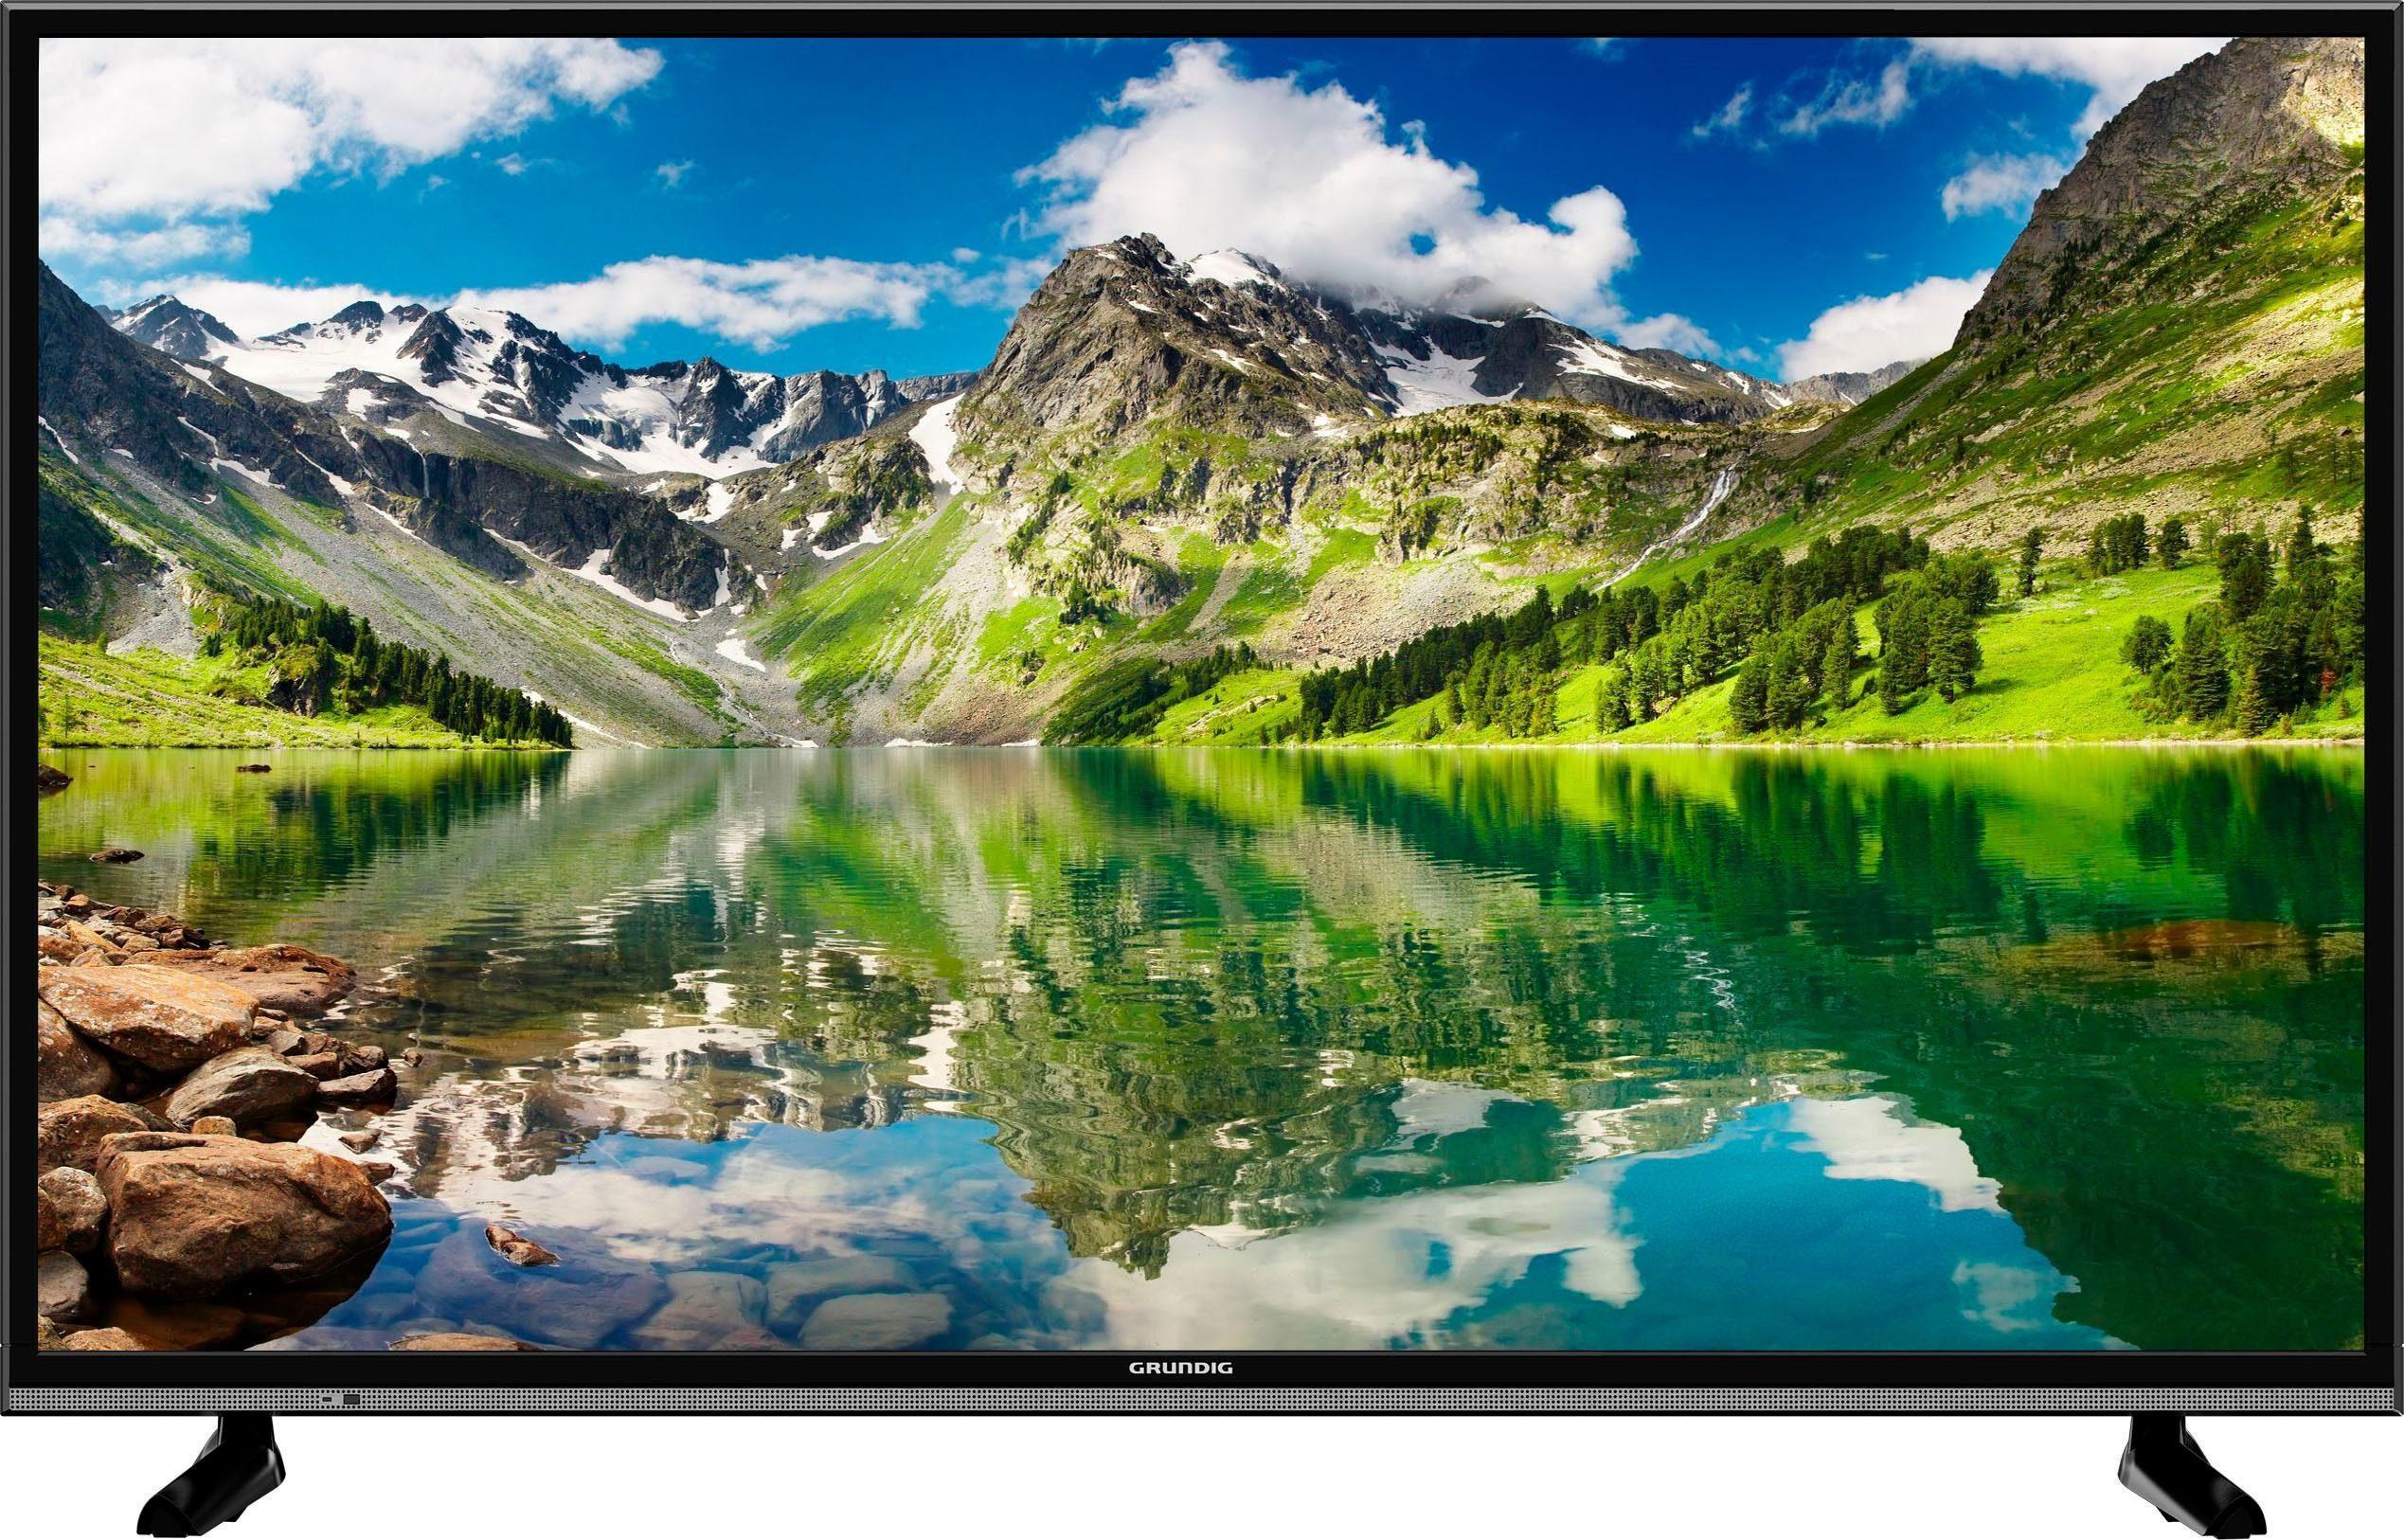 Grundig 43 VLX 8000 BP LED-Fernseher (108 cm/43 Zoll, 4K Ultra HD, Smart-TV)